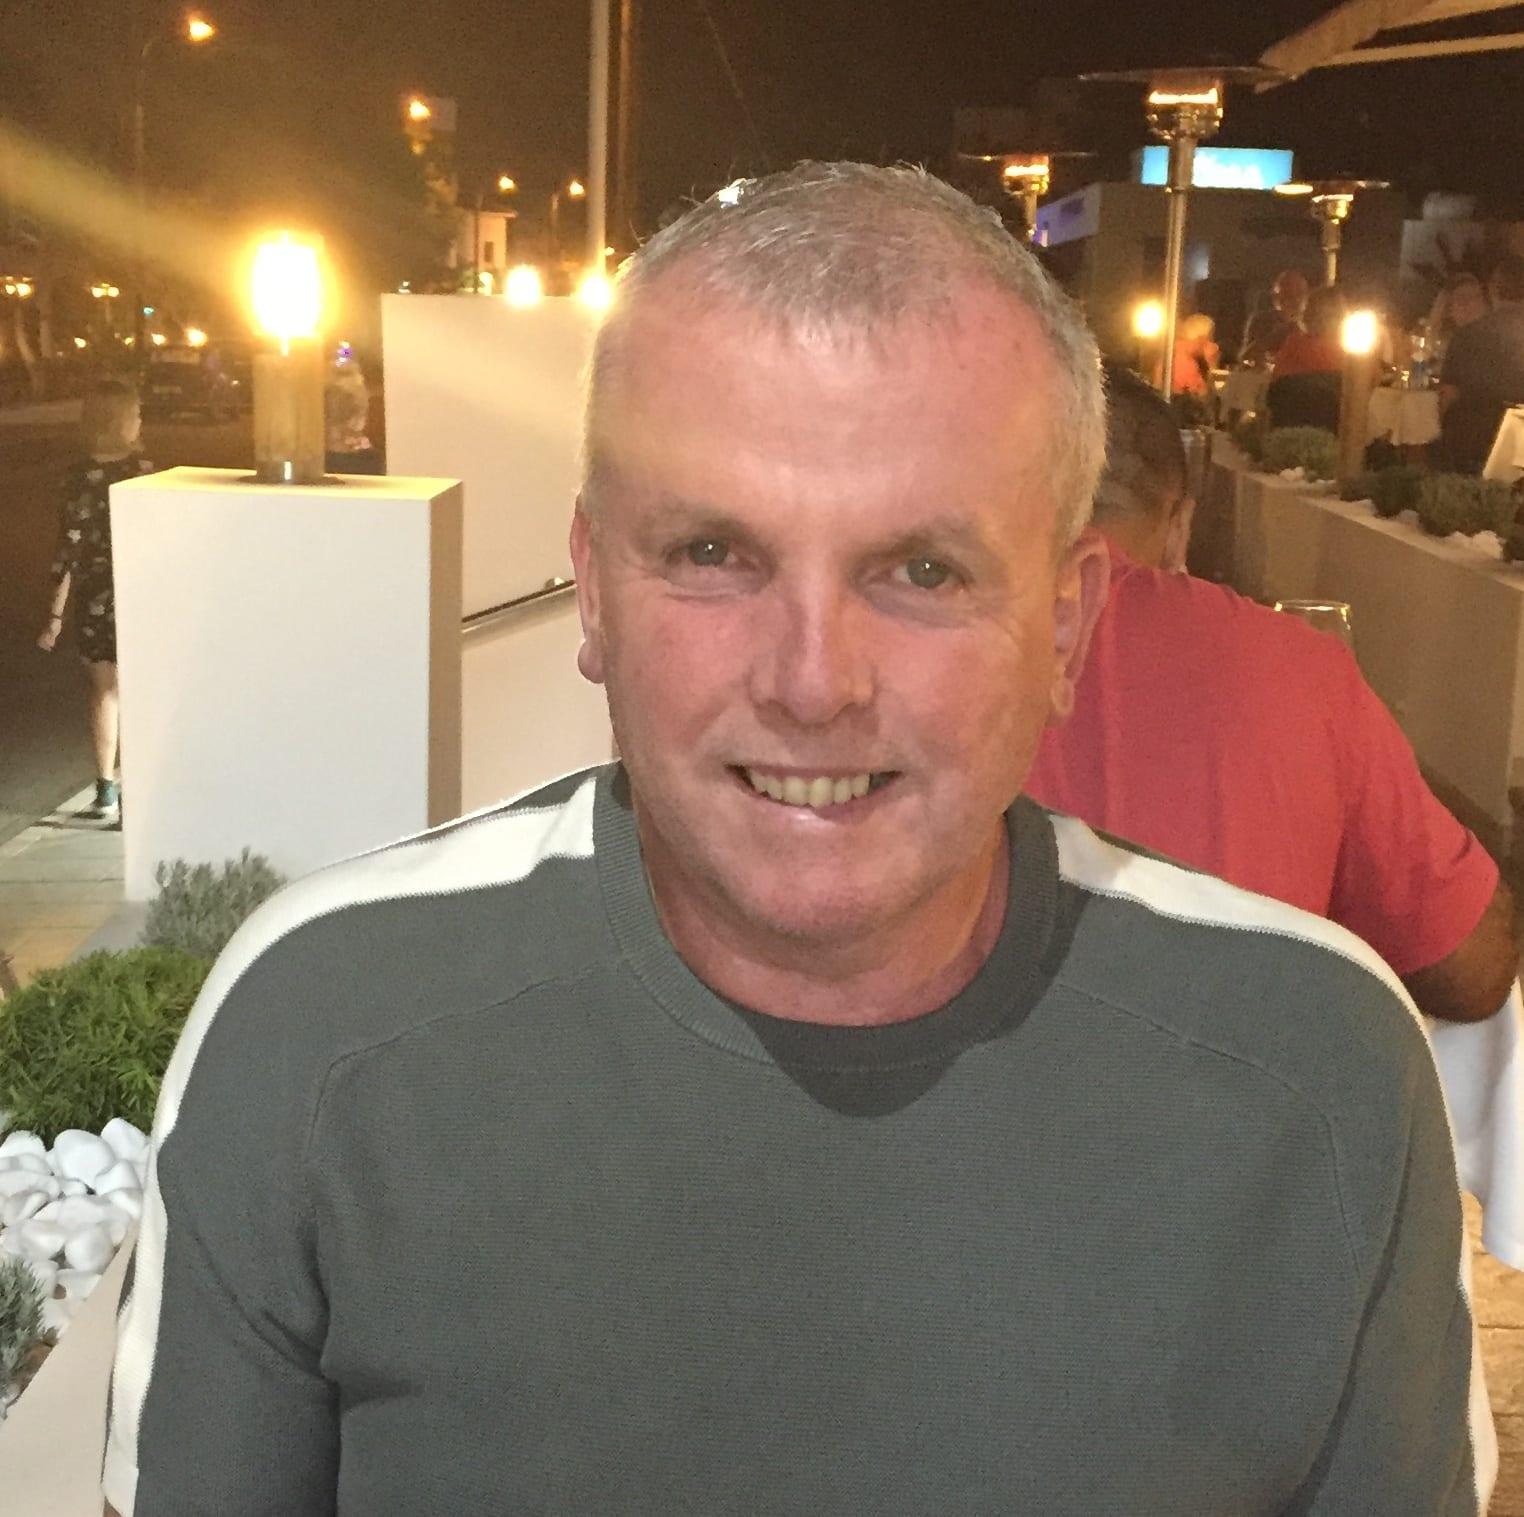 Paul Broadhead sits outside at a restaurant